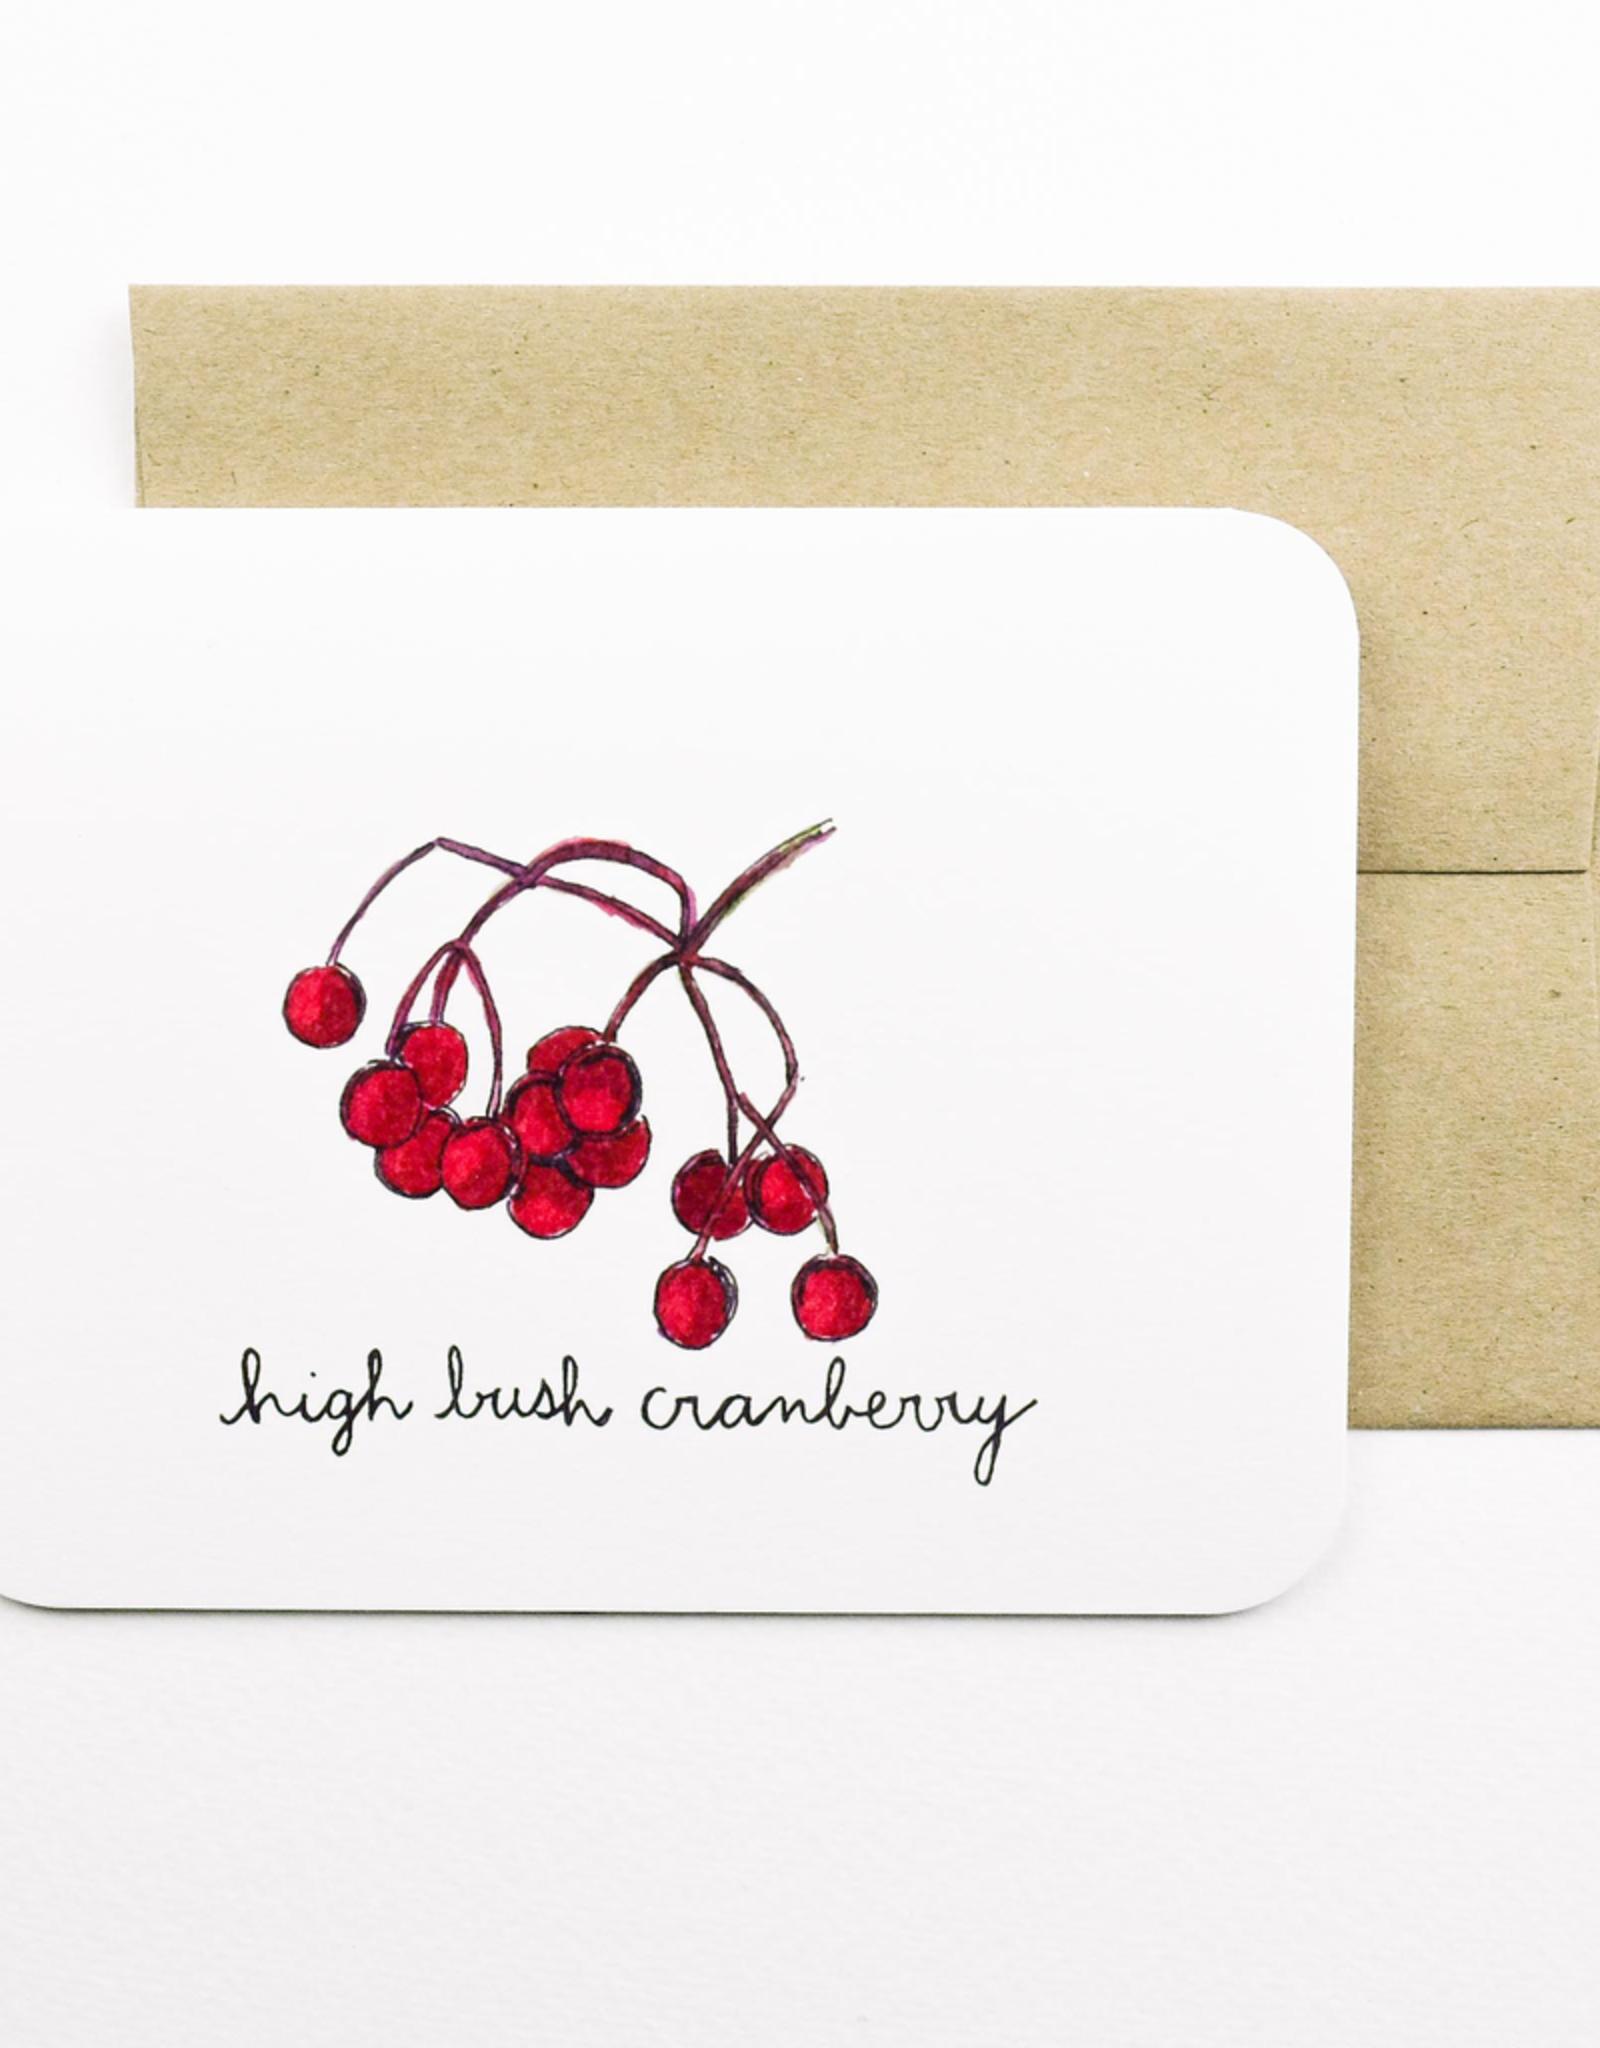 High Bush Cranberry Card